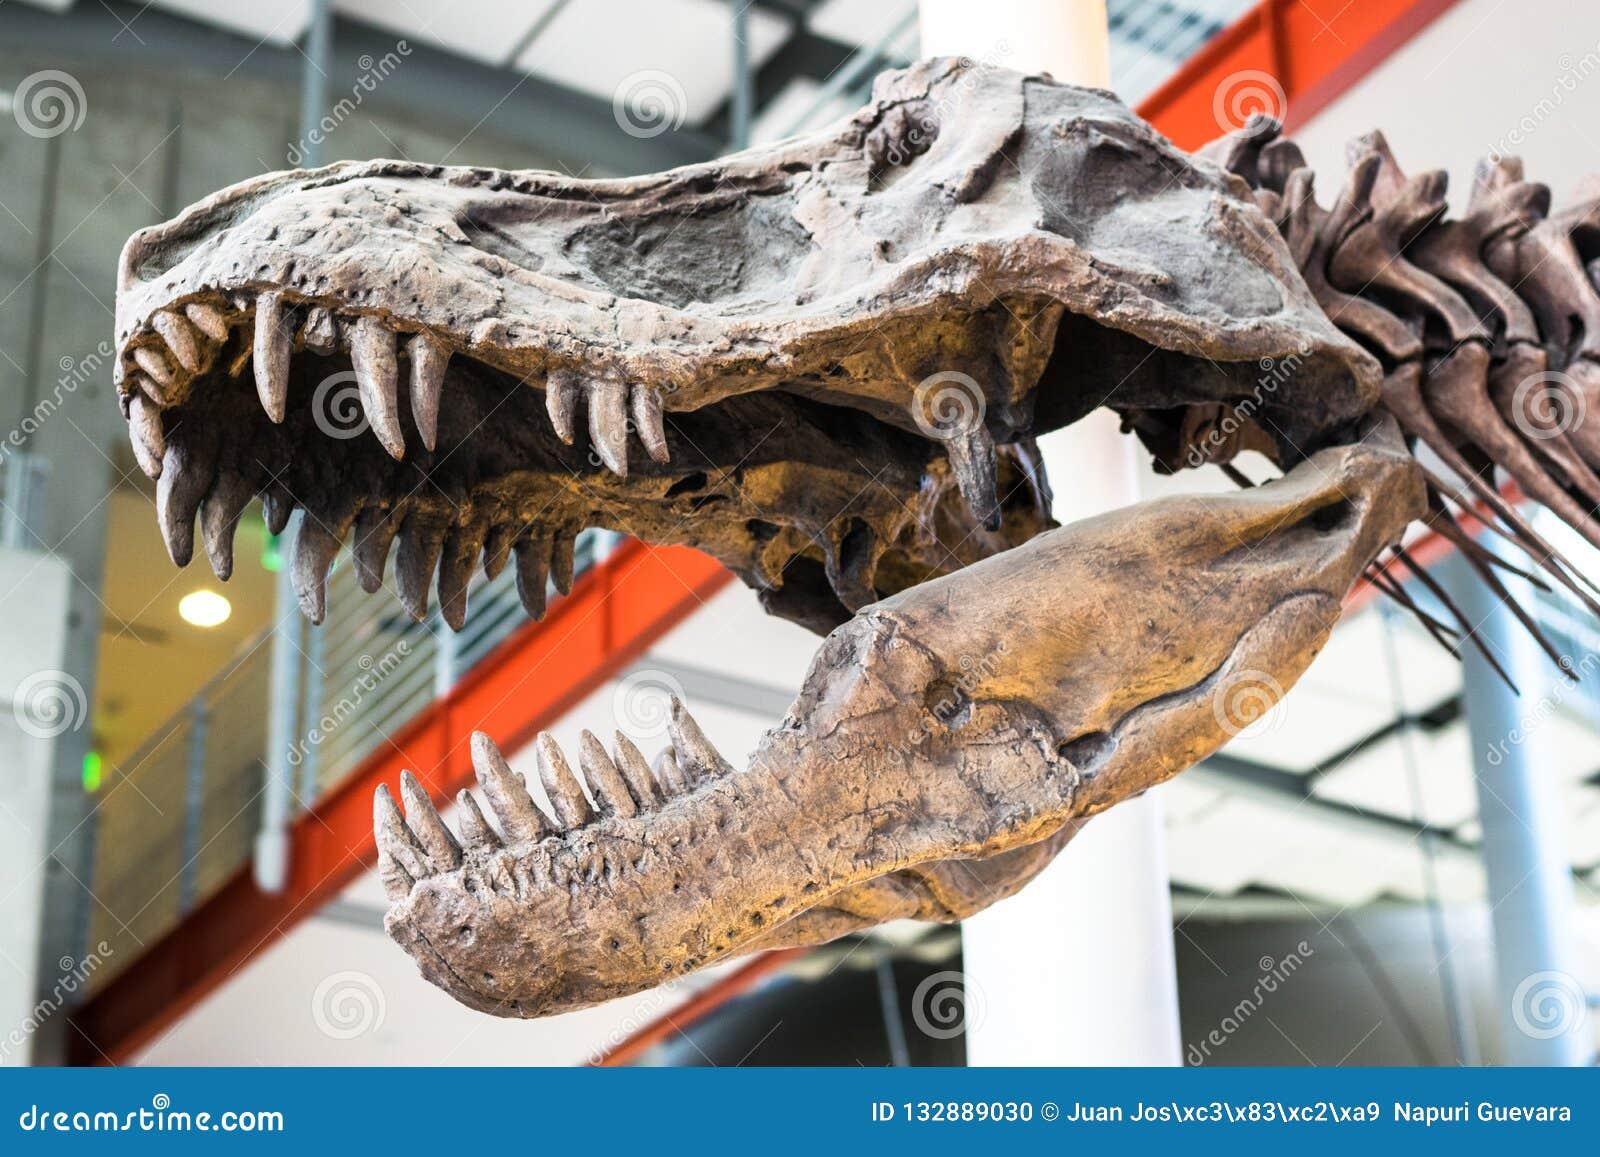 Tiranosaurio Rex Dinosaur Fossil Un cráneo fósil del dinosaurio del rex del tiranosaurio contra un fondo unfocused